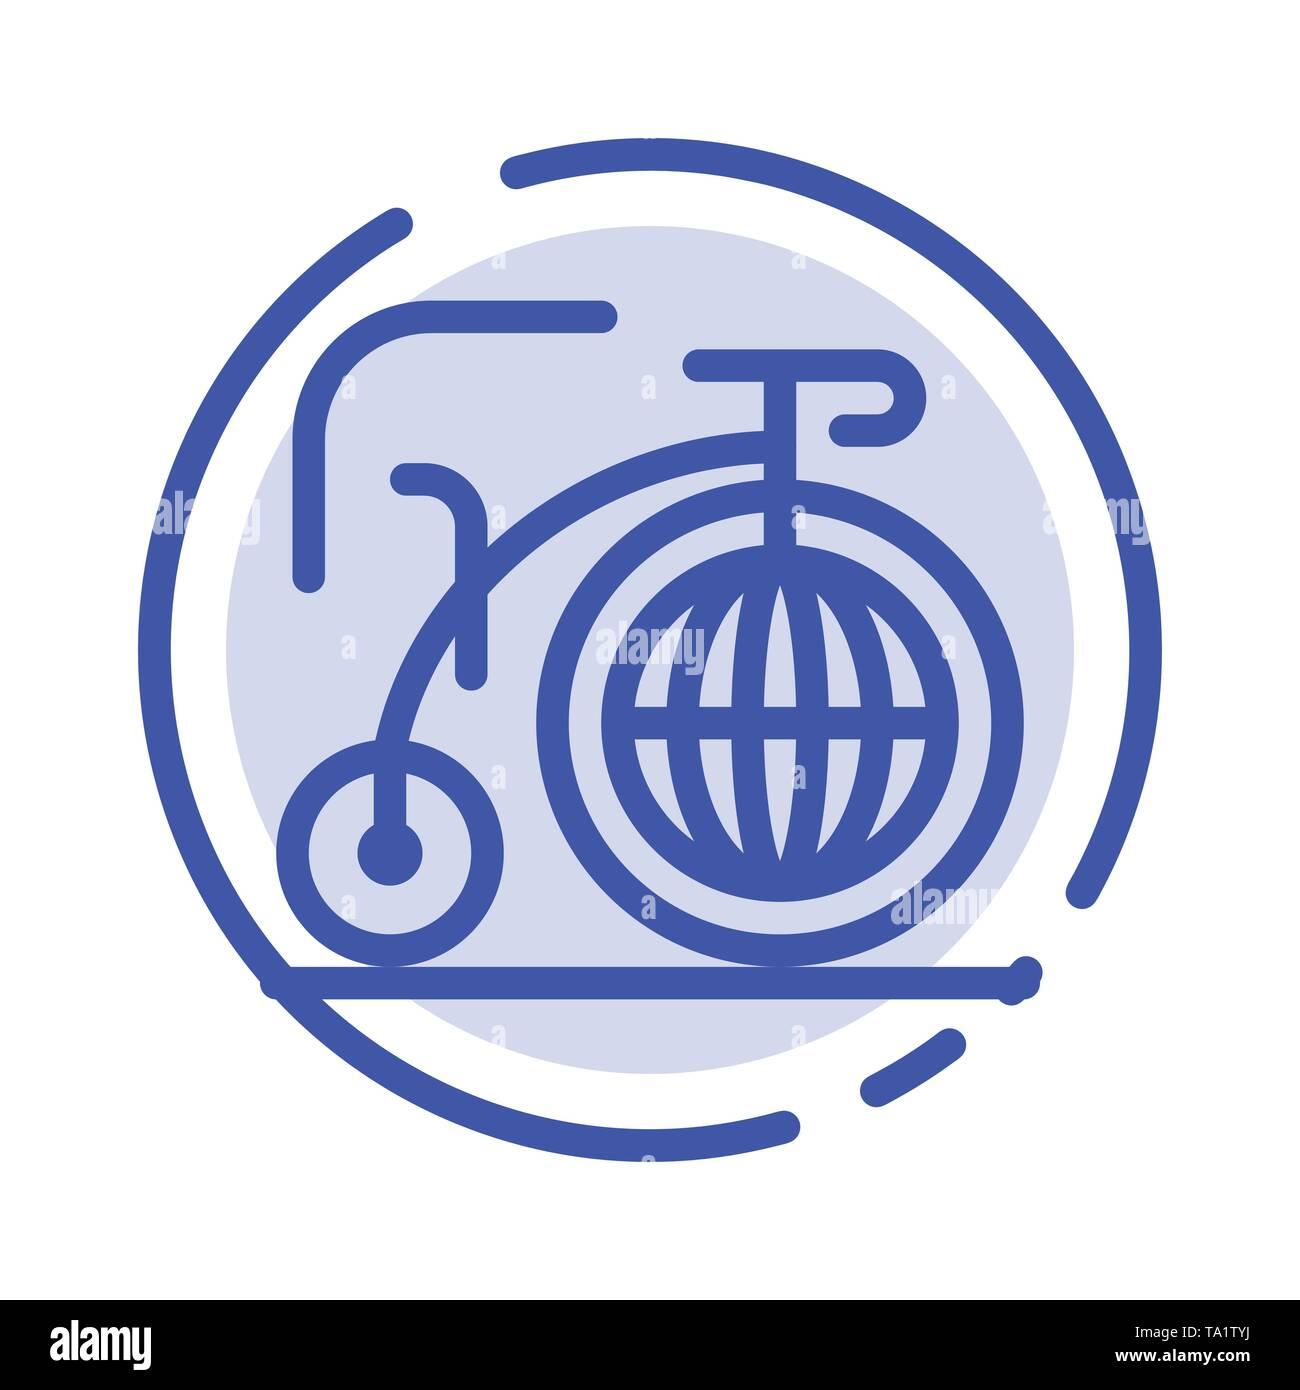 Big, Bike, Dream, Inspiration Blue Dotted Line Line Icon - Stock Image